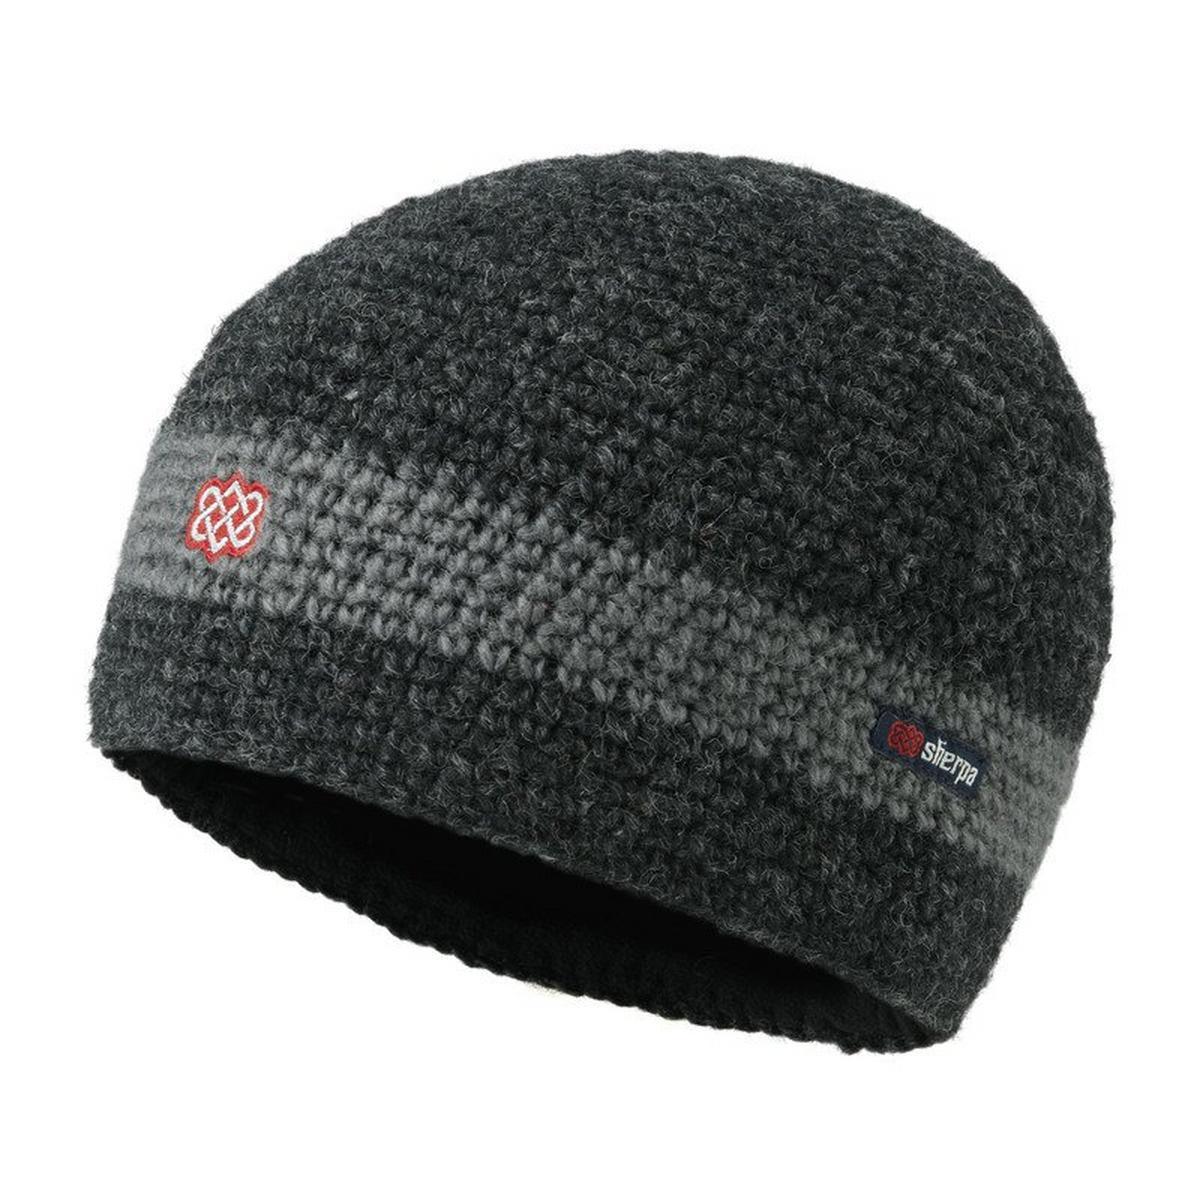 Sherpa Adventure Renzing Hat